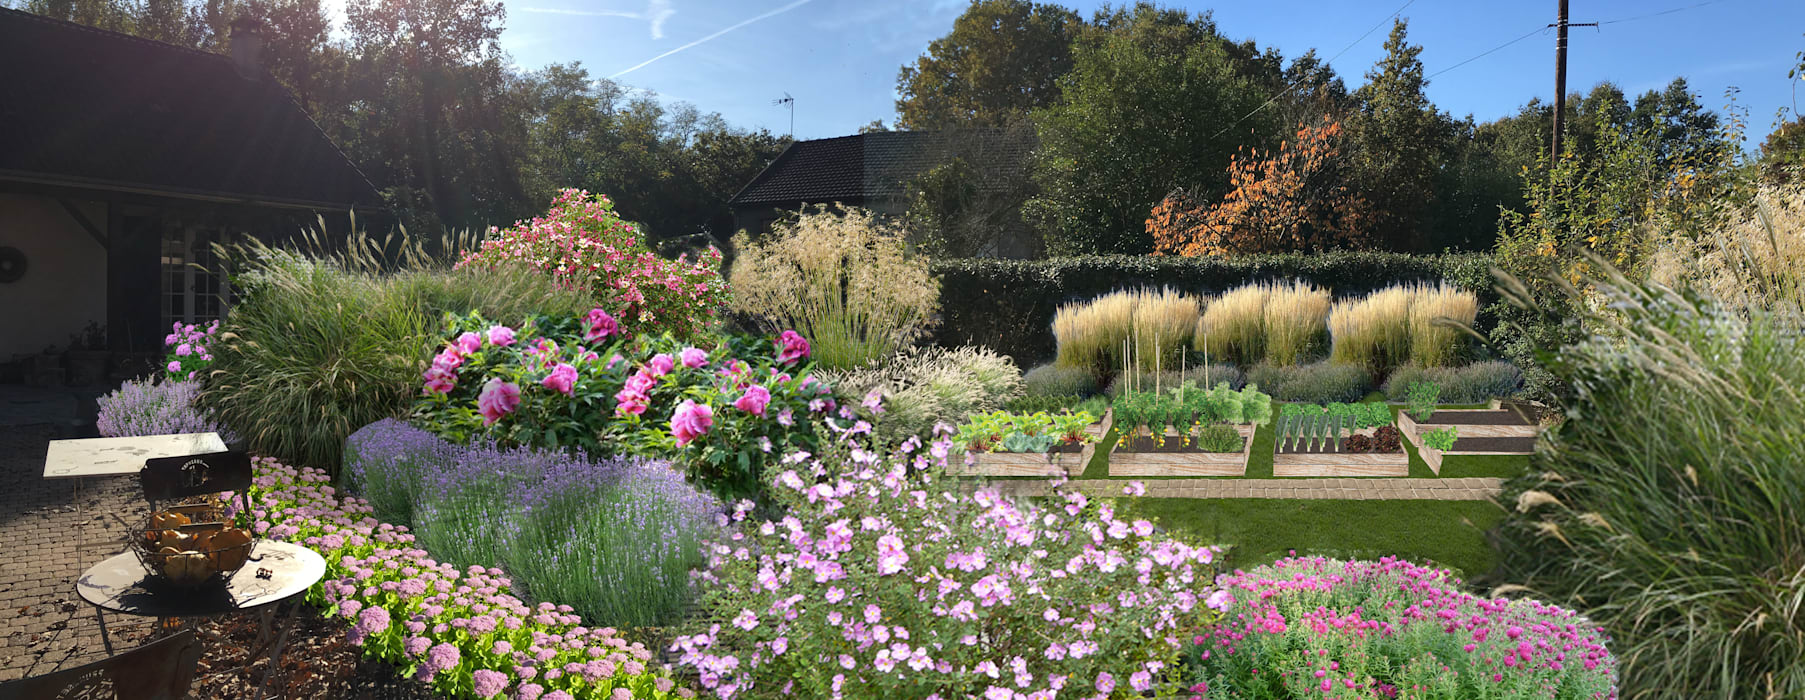 Jardin De Graminees Vivaces Eragny Sur Oise 95 Jardin De